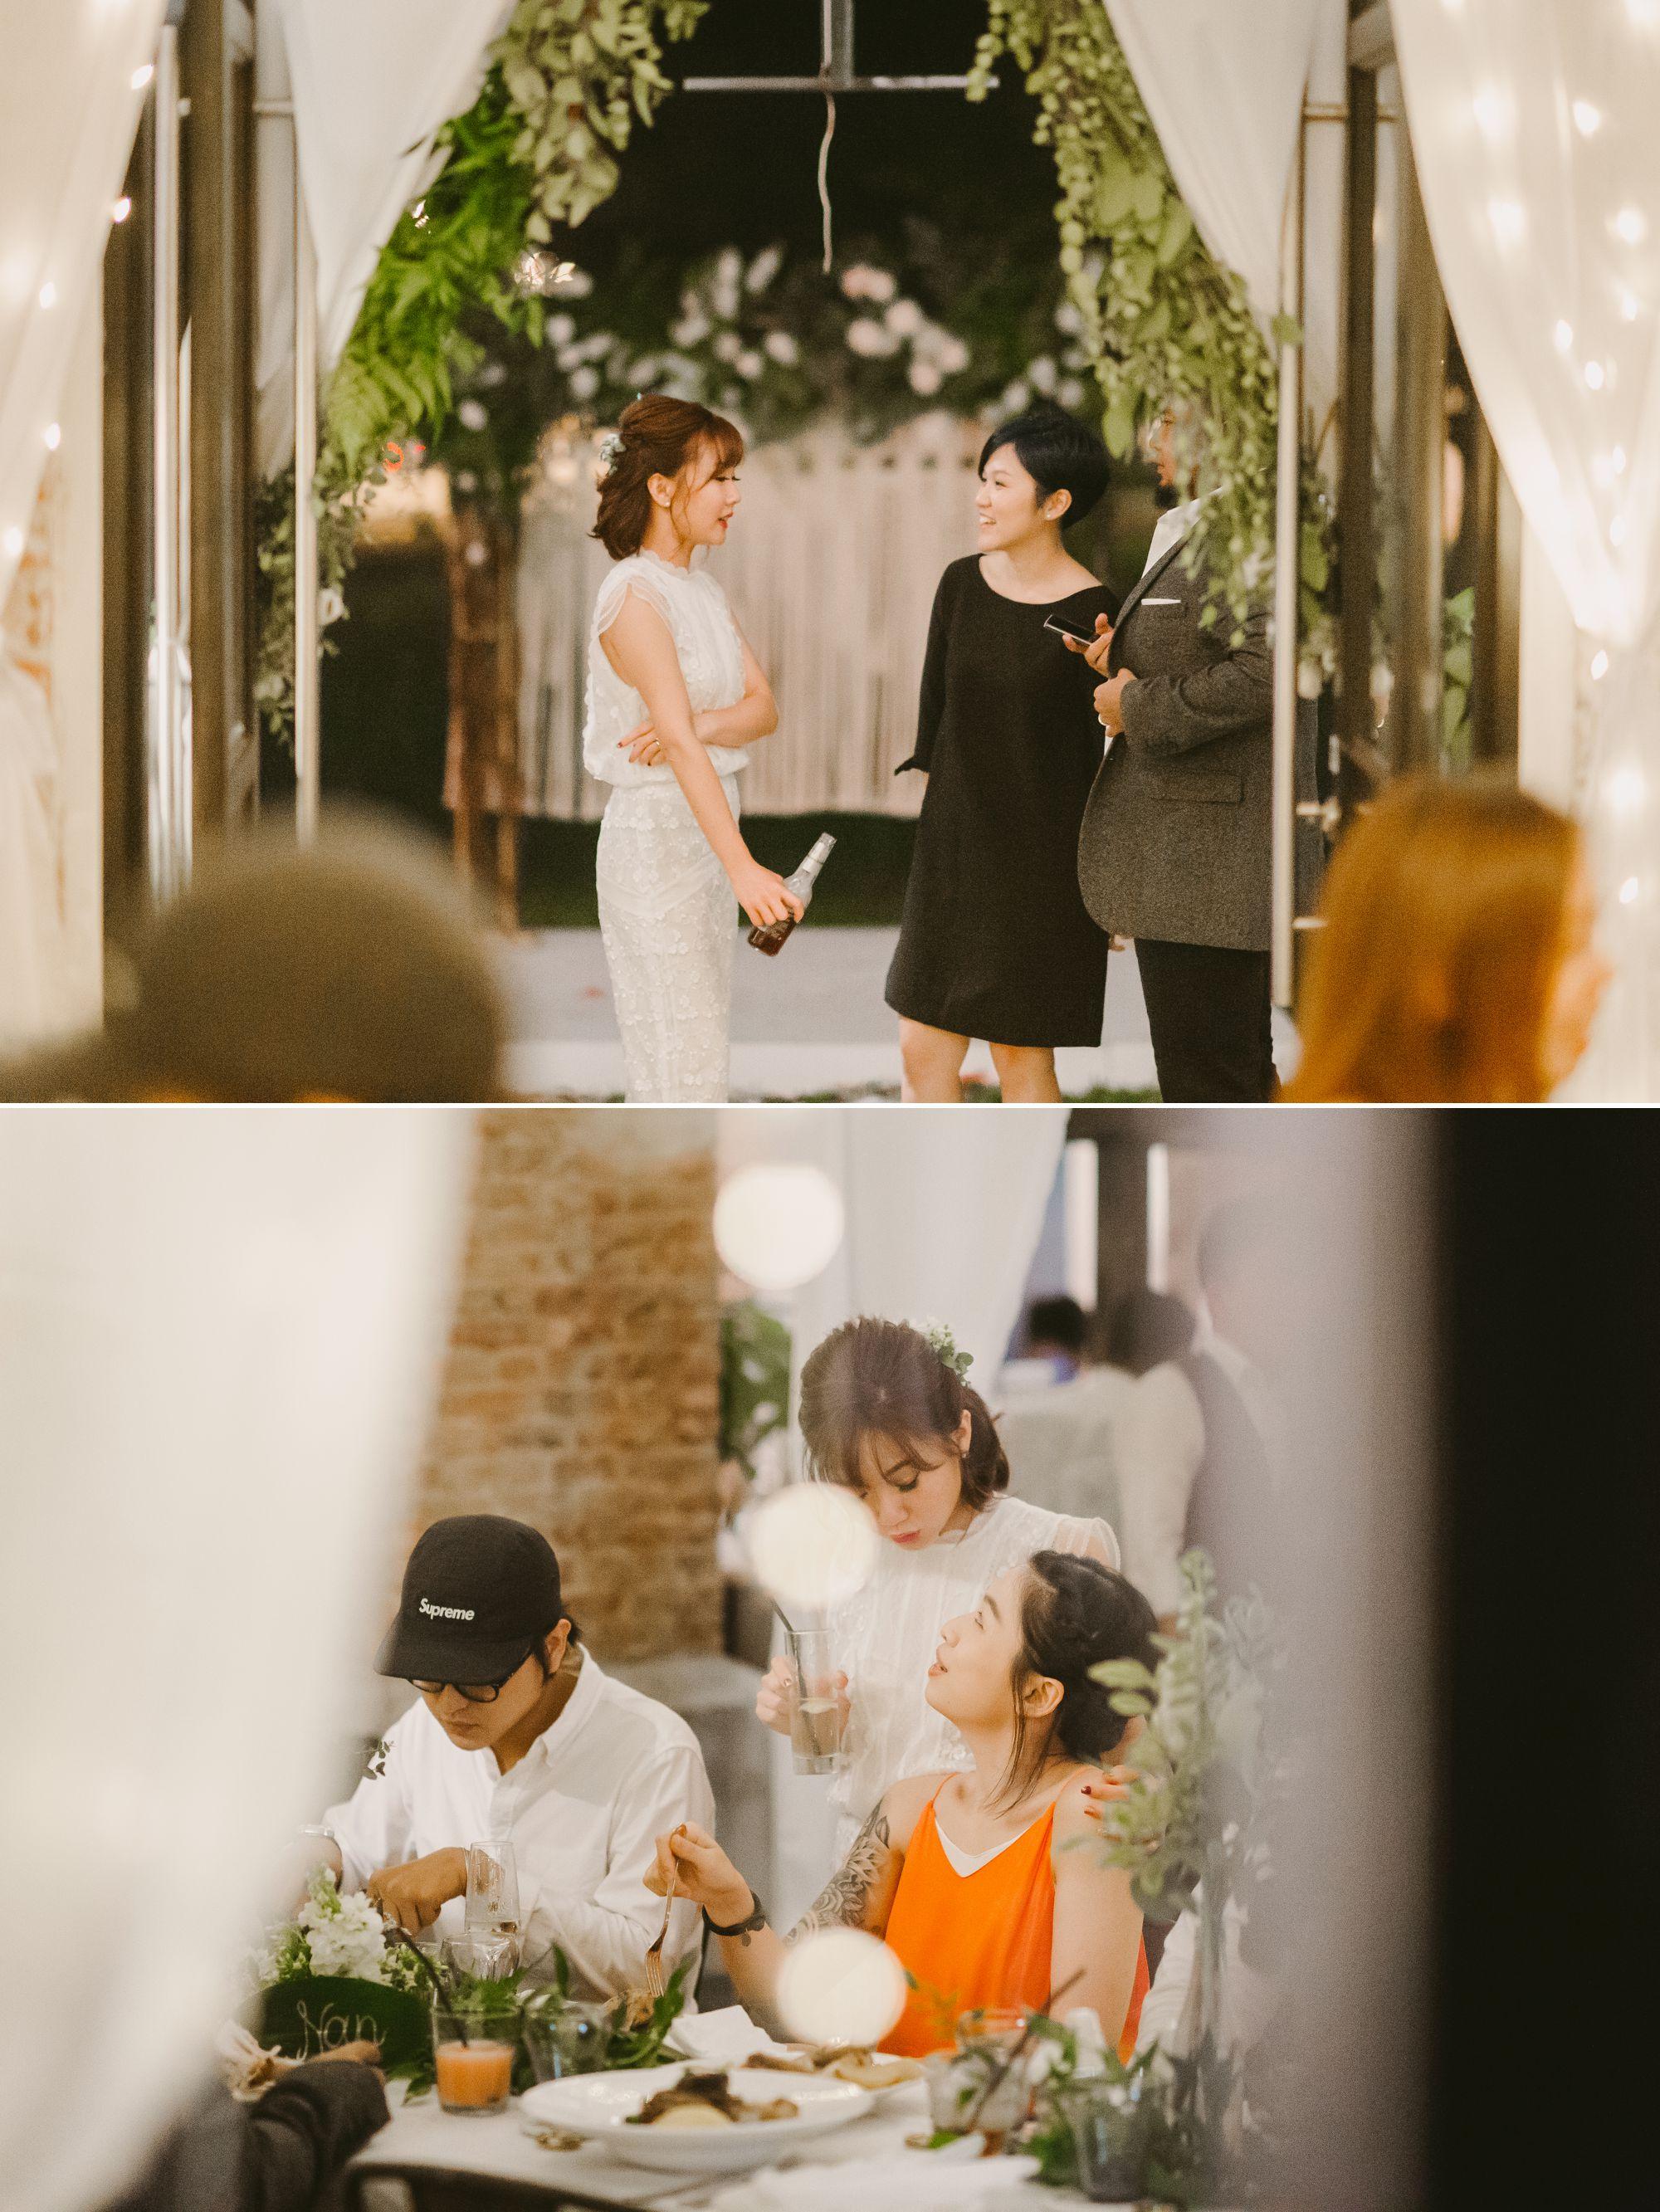 wedding_photography 39.jpg